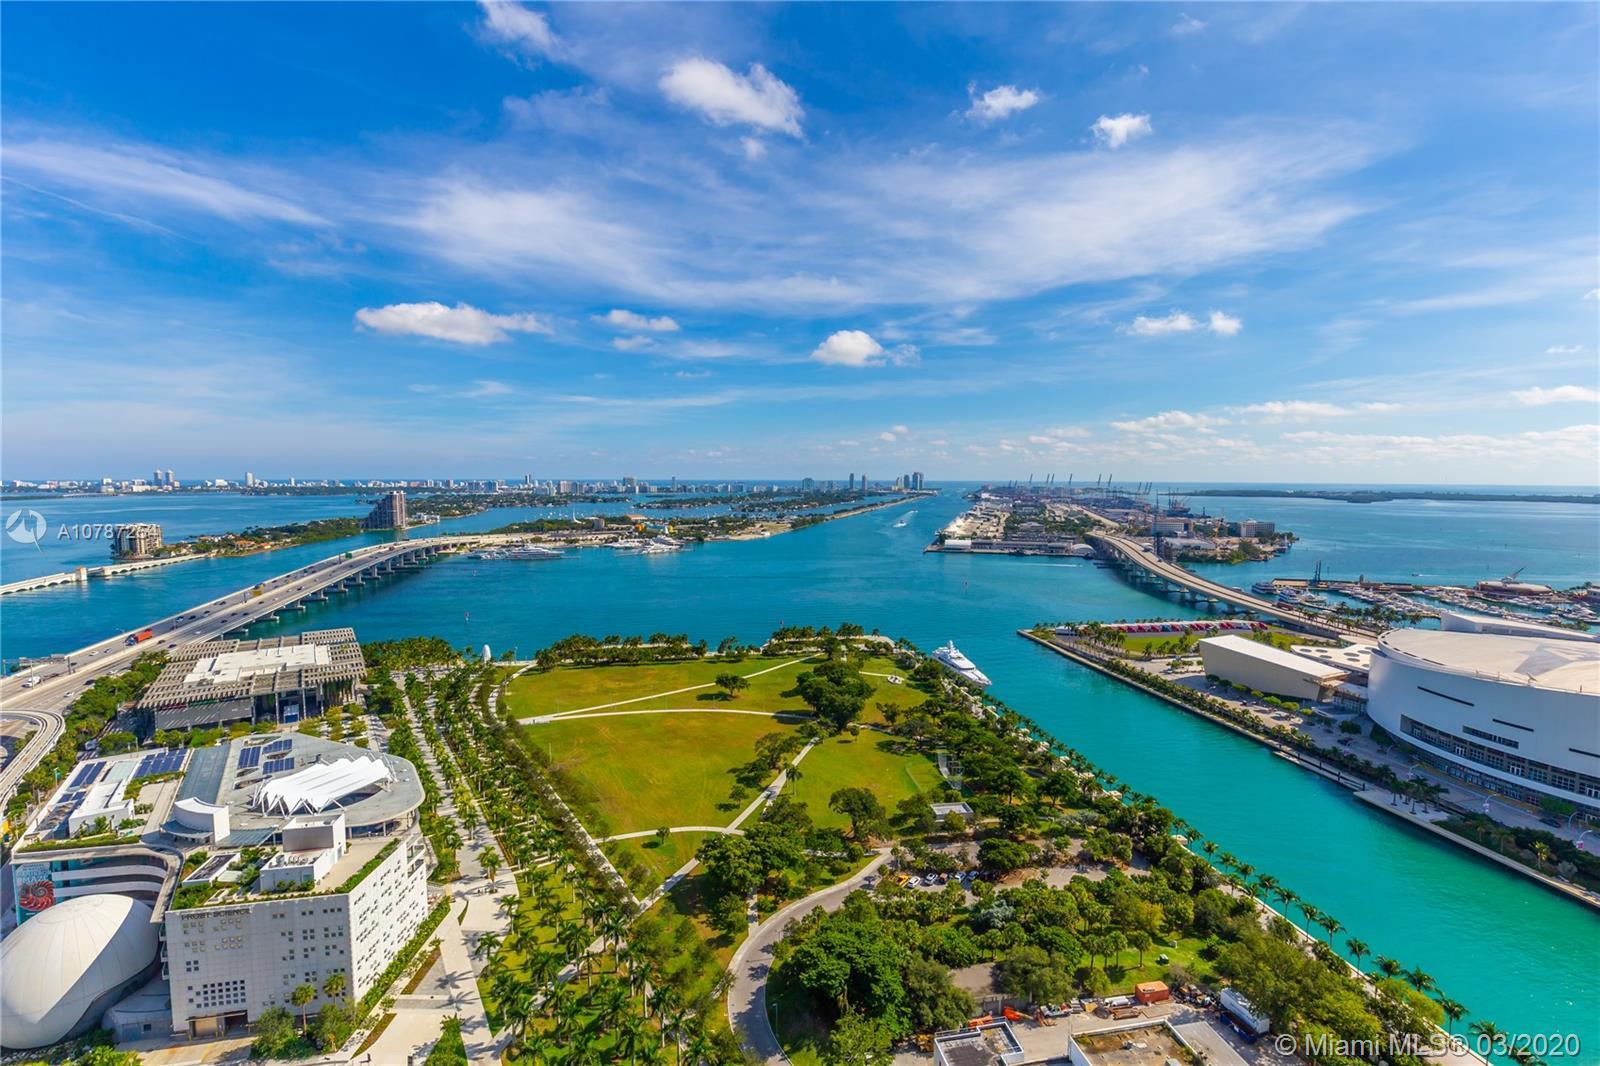 1000 Biscayne Blvd, 3302 - Miami, Florida